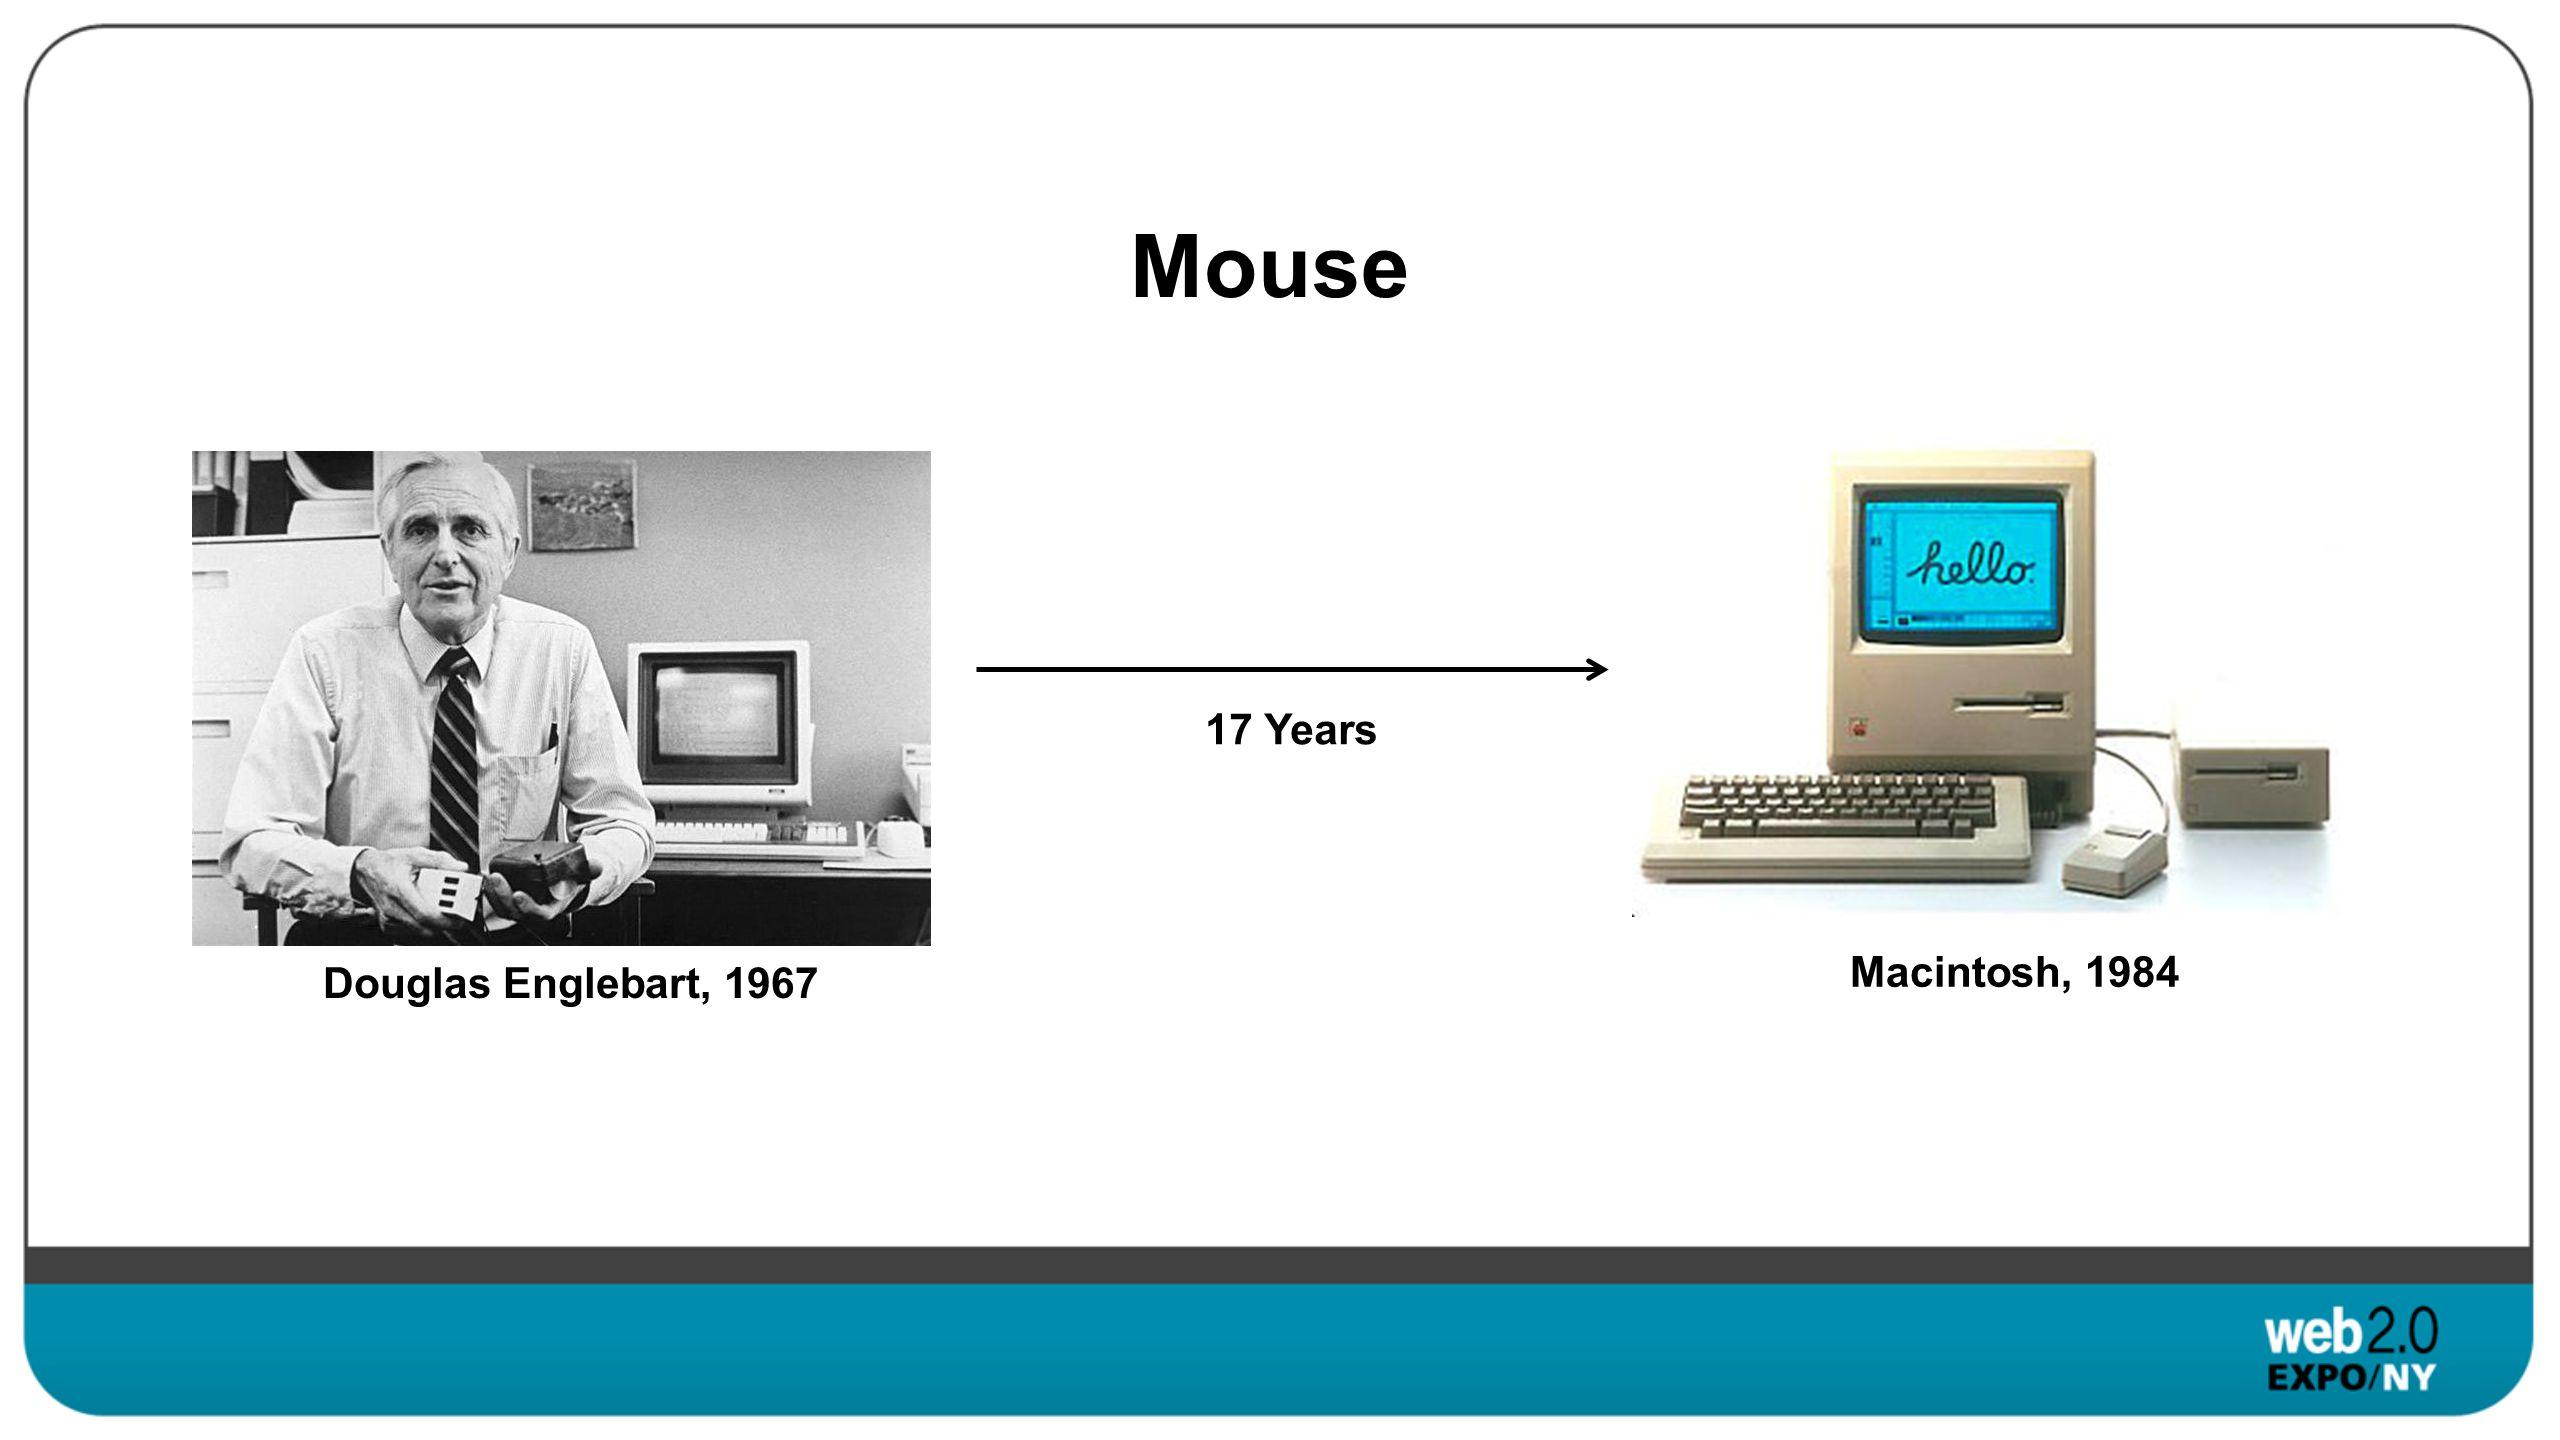 Douglas Englebart, 1967 Macintosh, 1984 Mouse 17 Years